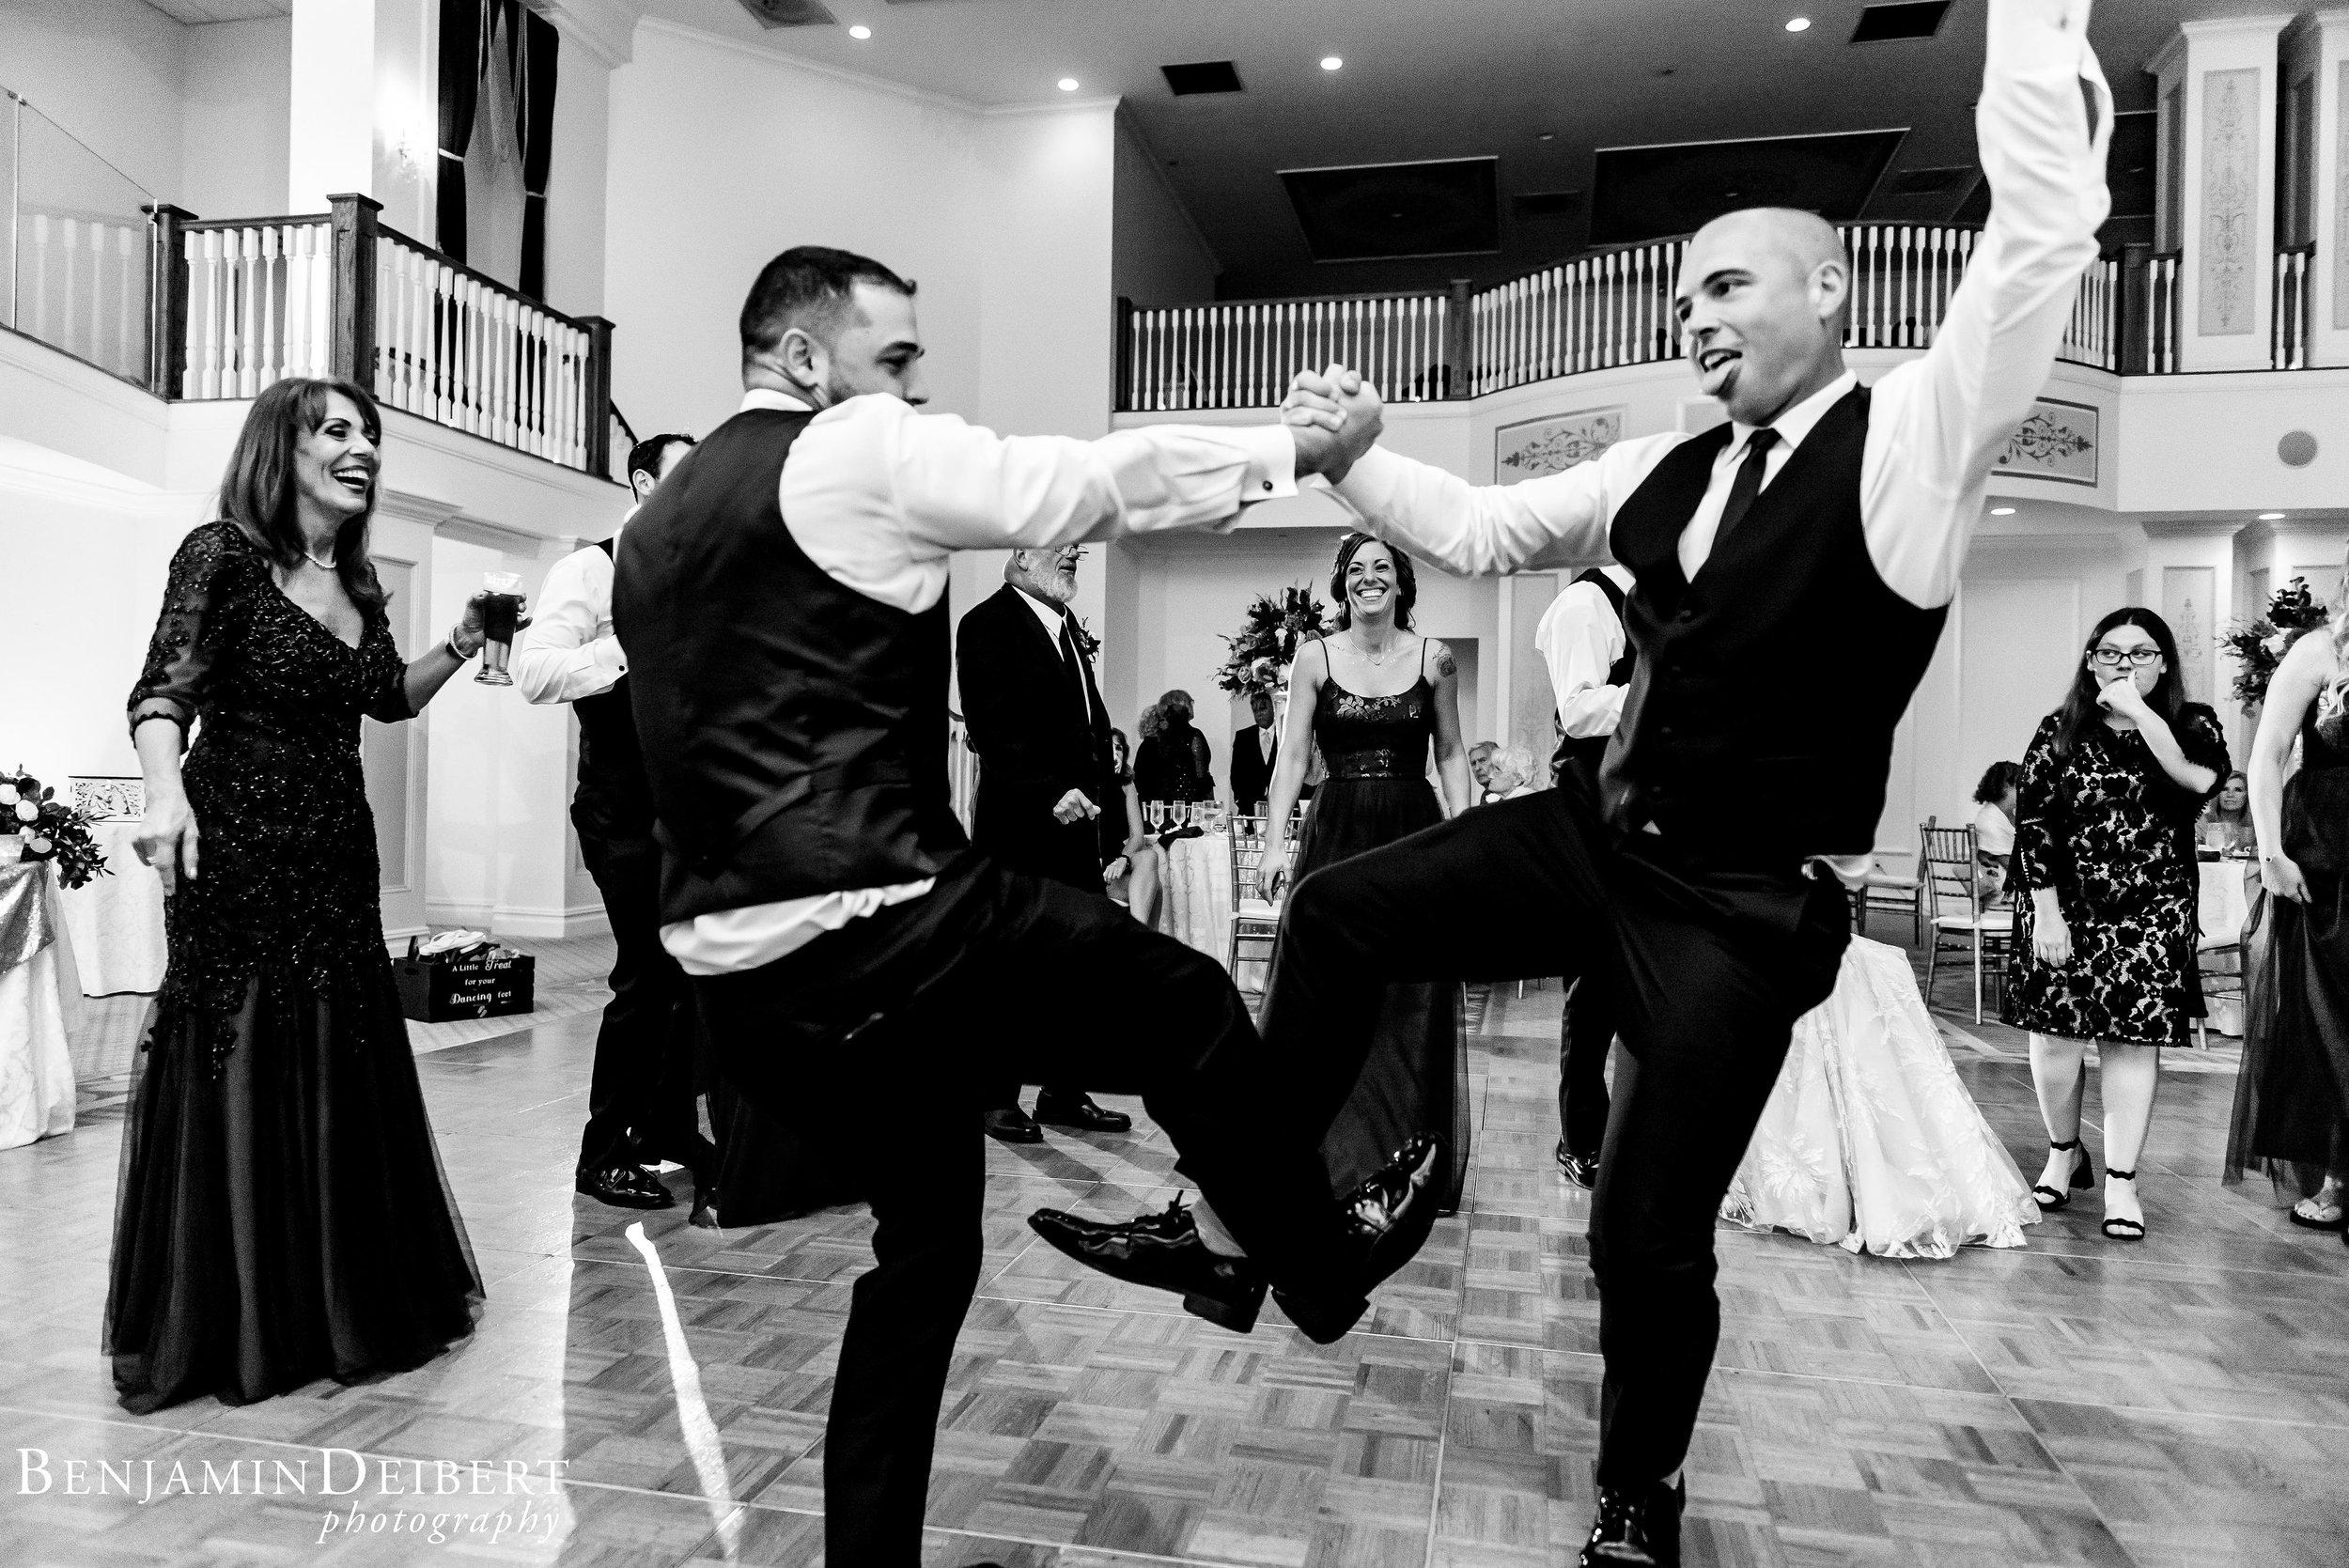 AmandaandElliott_TheCarriageHouse_Wedding-61.jpg